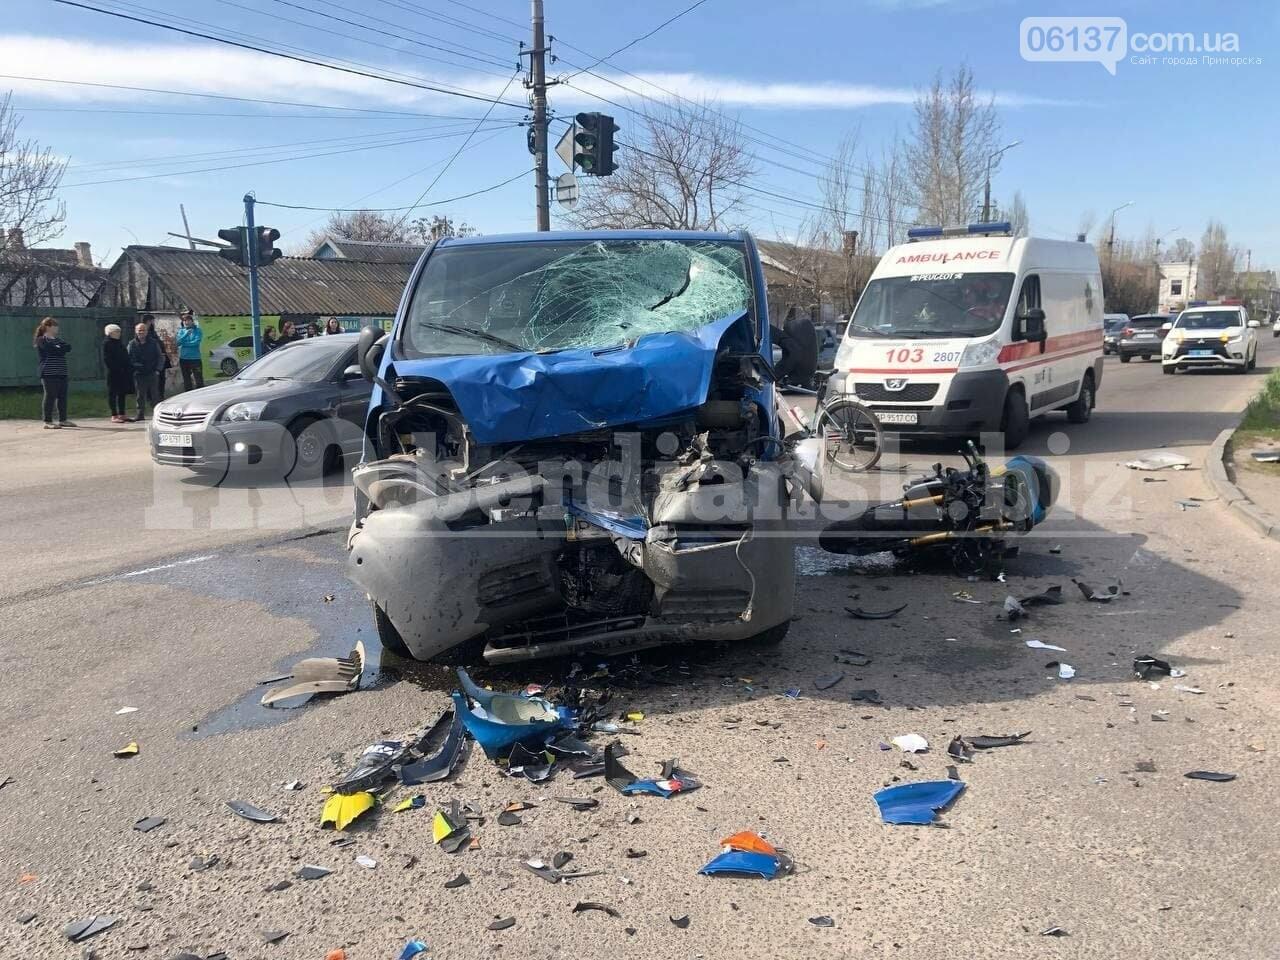 Крупное ДТП на курорте Запорожской области: три человека пострадали. Видео   , фото-1